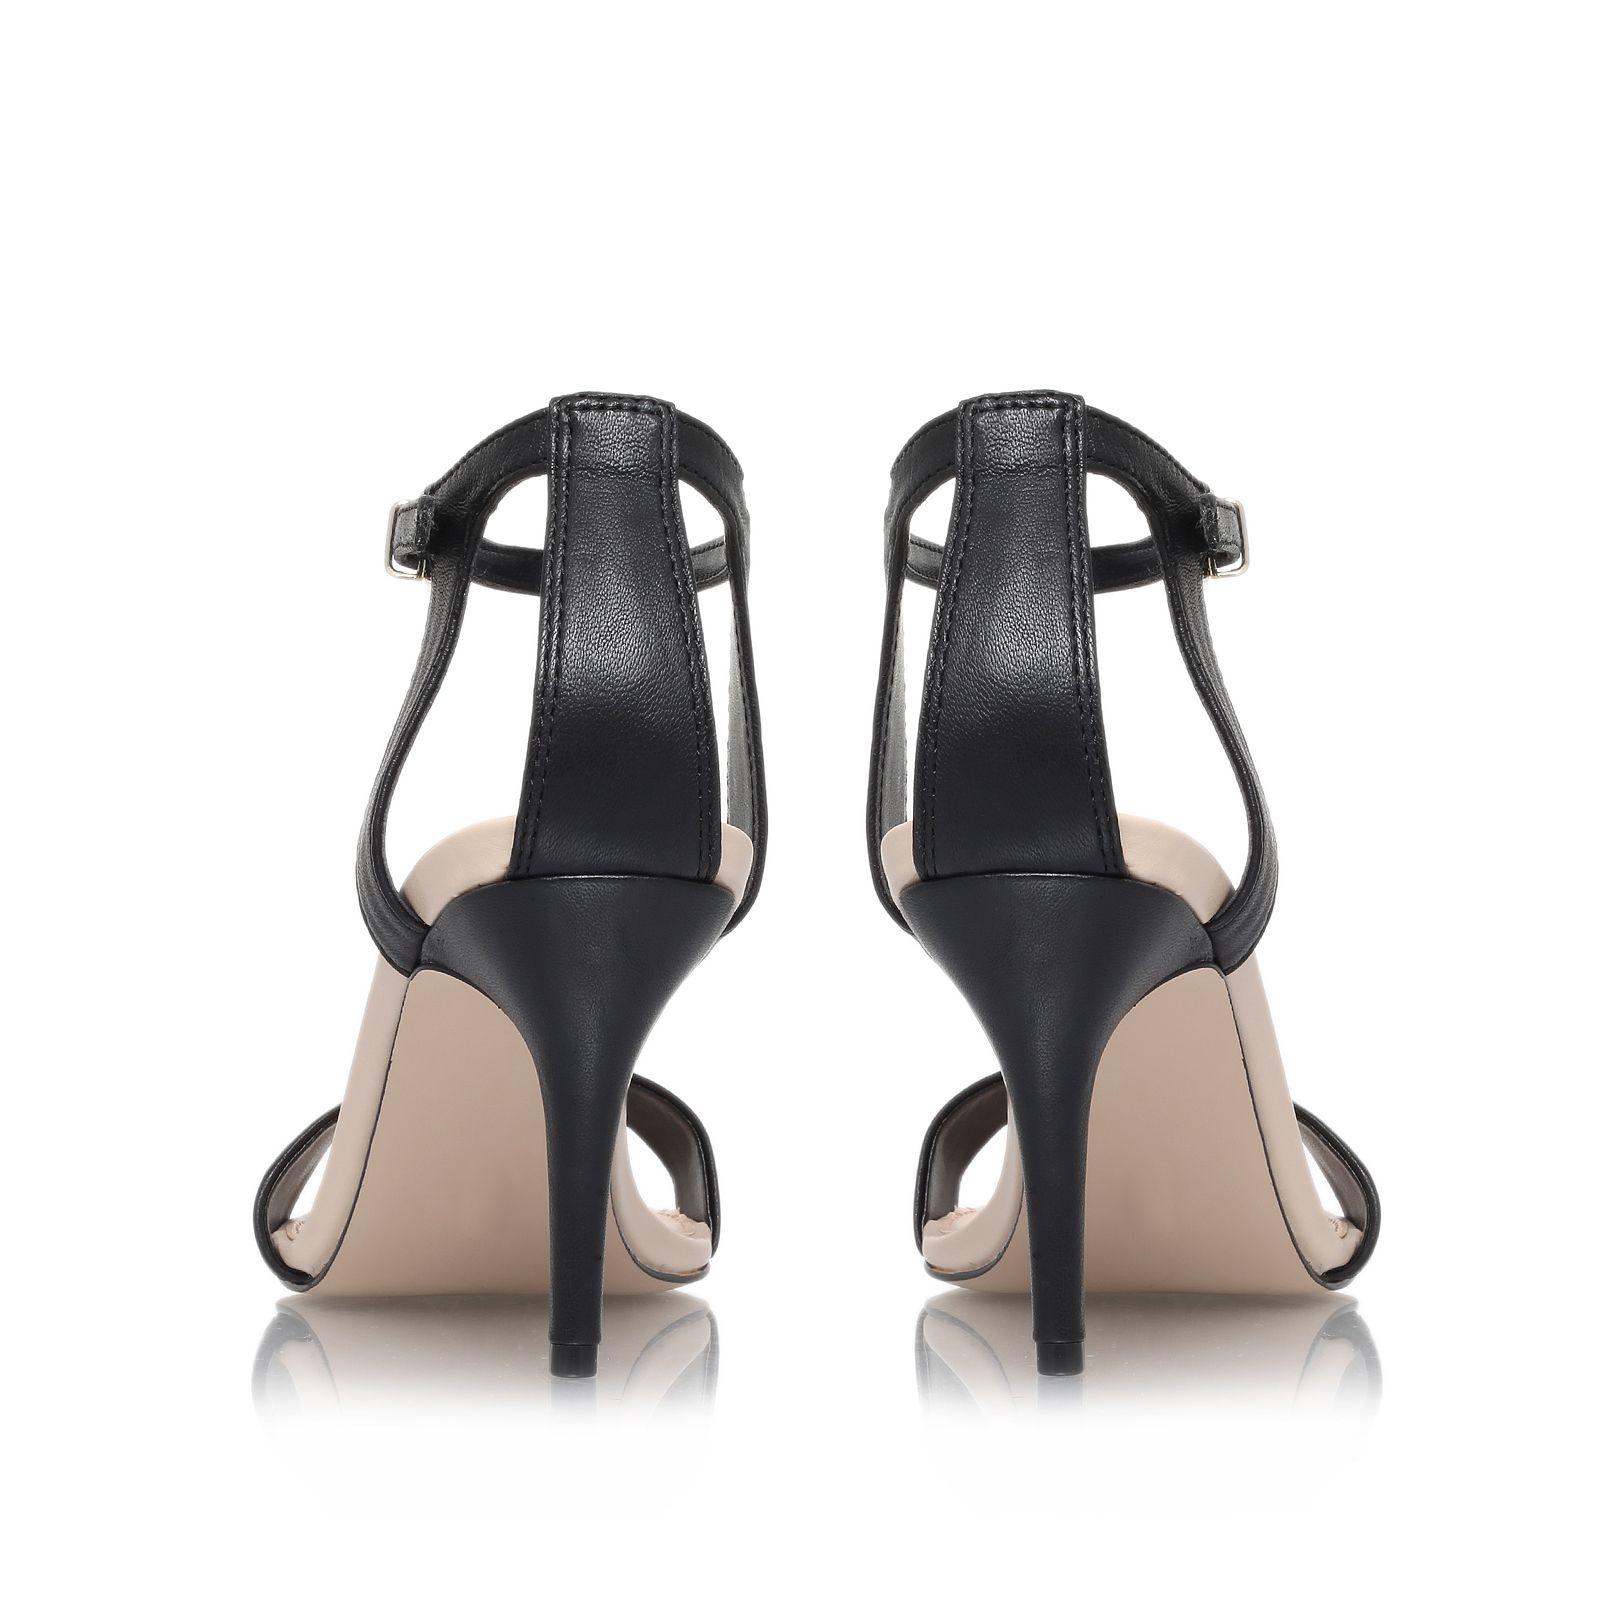 KOLLUDE   Mid heel sandals, Kurt geiger, Sandals